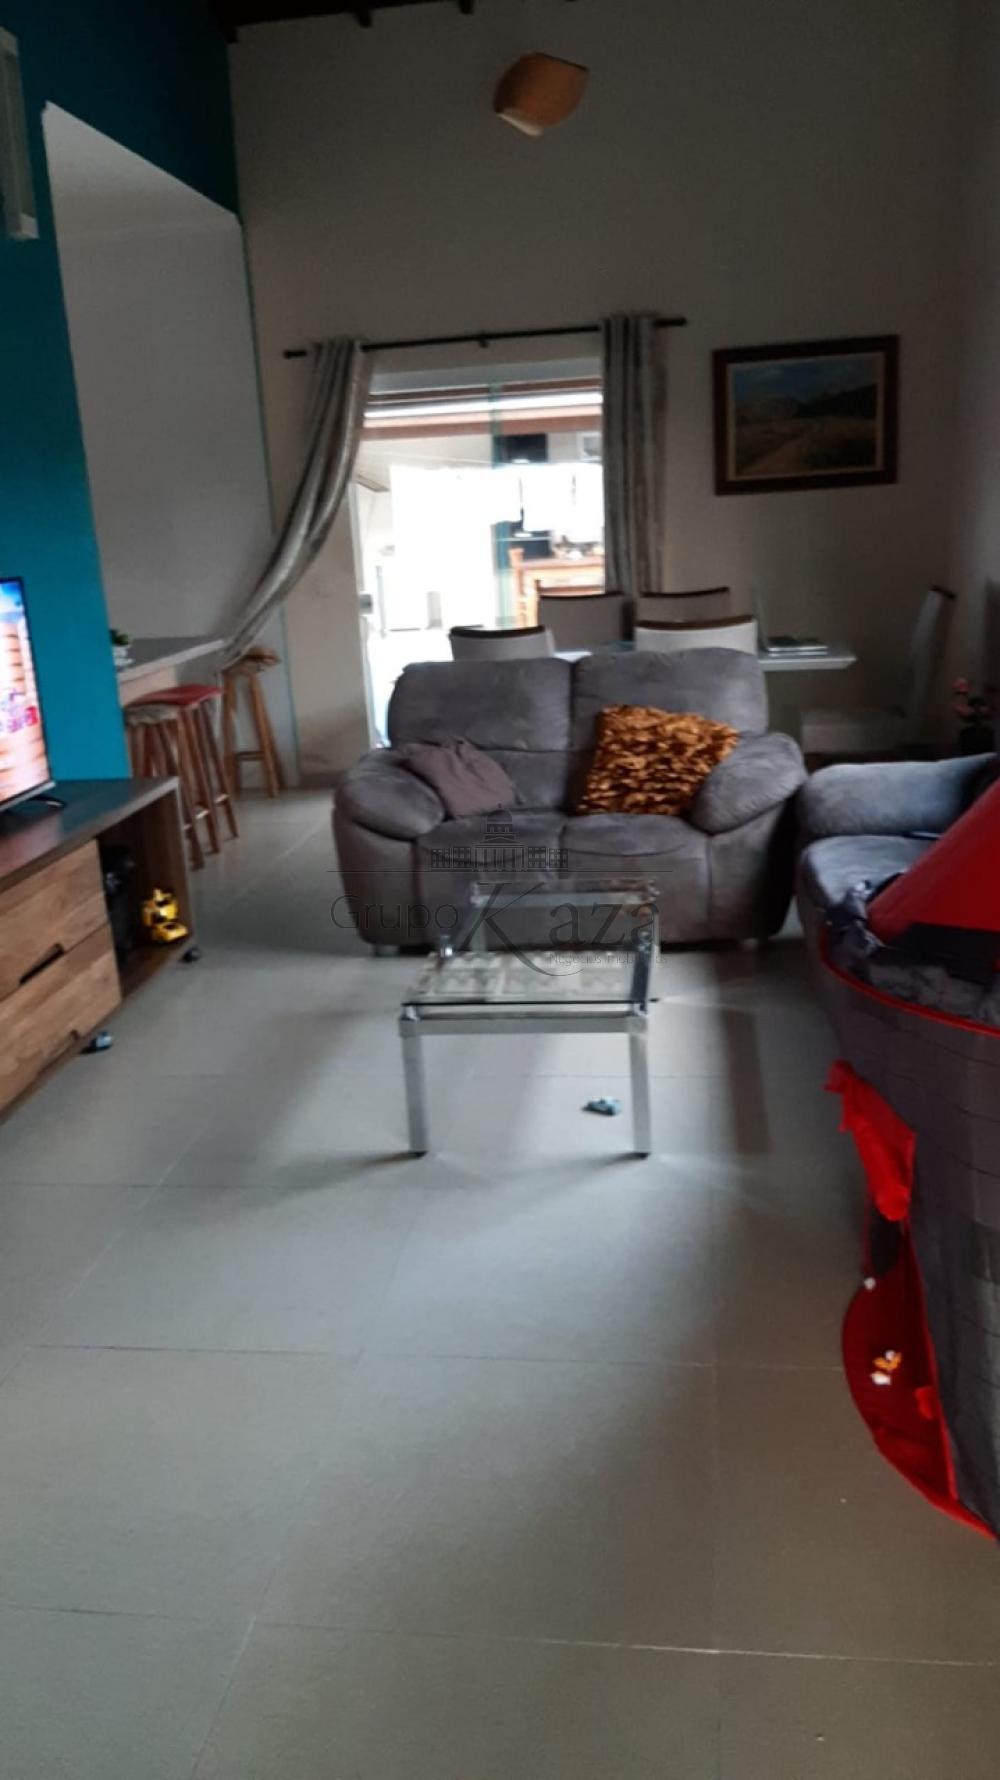 alt='Comprar Casa / Térrea em Caraguatatuba R$ 590.000,00 - Foto 5' title='Comprar Casa / Térrea em Caraguatatuba R$ 590.000,00 - Foto 5'